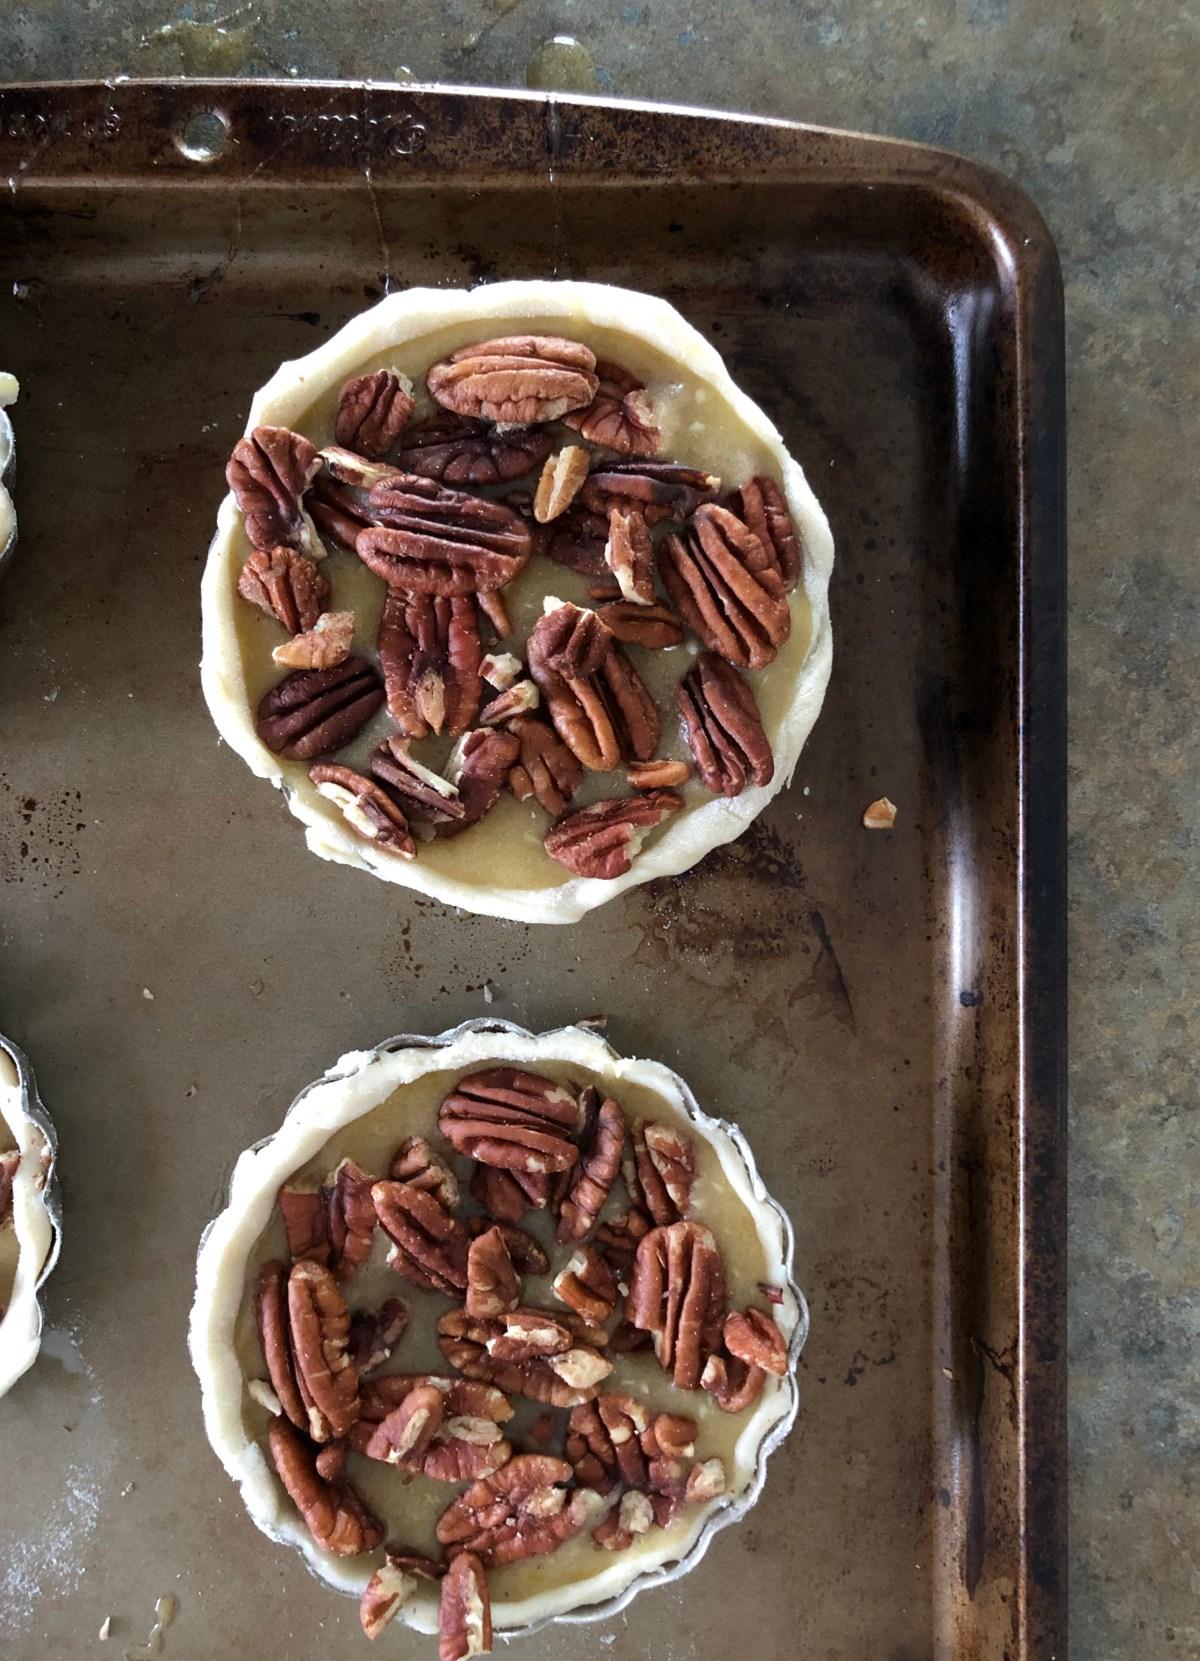 Maple Pecan Tarts by Happylifeblogspot.com #pecanpie #minitarts #pecantart #thanksgivingdessert #maplepecan #minipecantarts